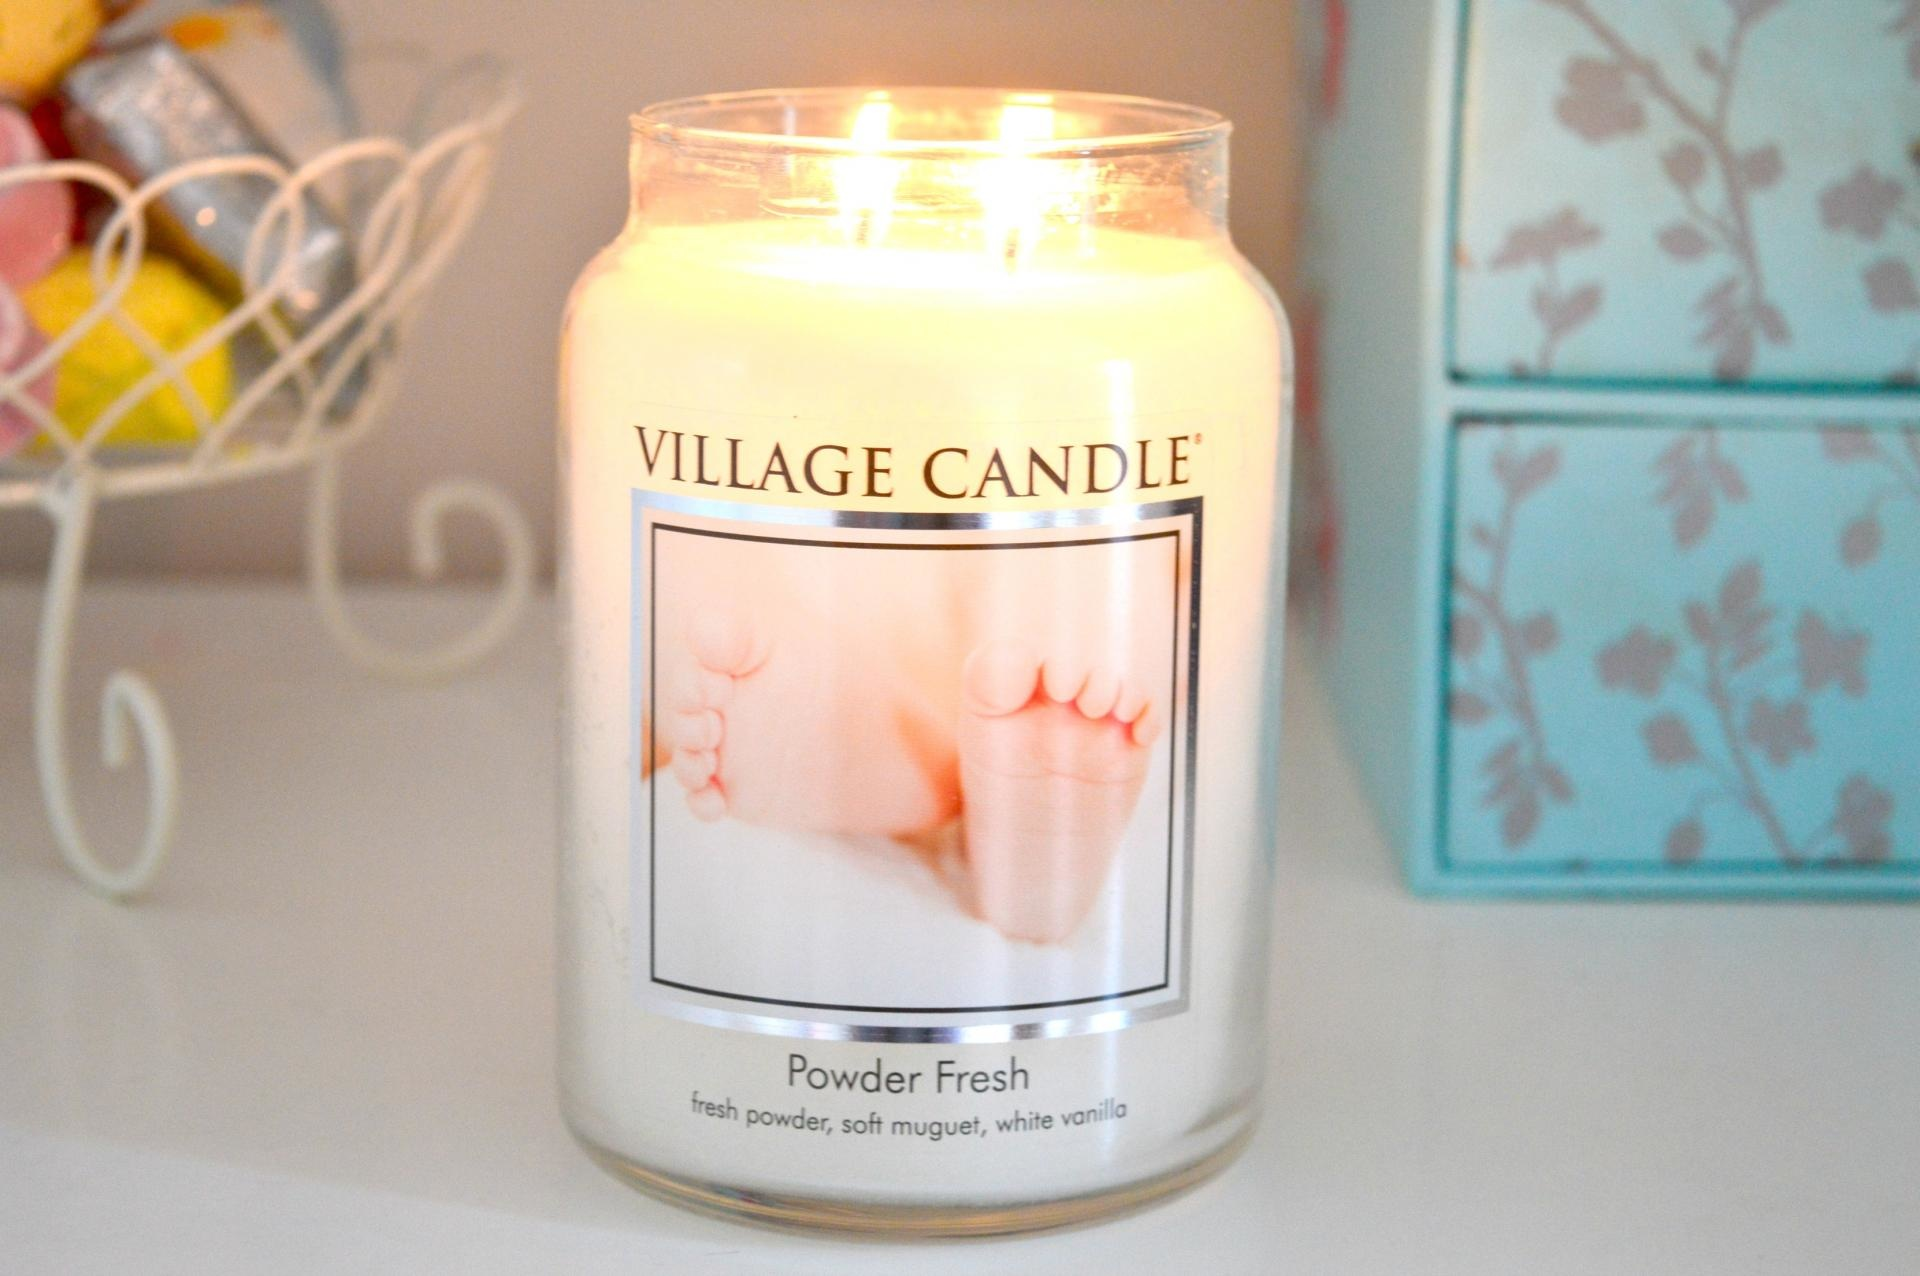 Village Candle Village Candle Powder Fresh Large Jar